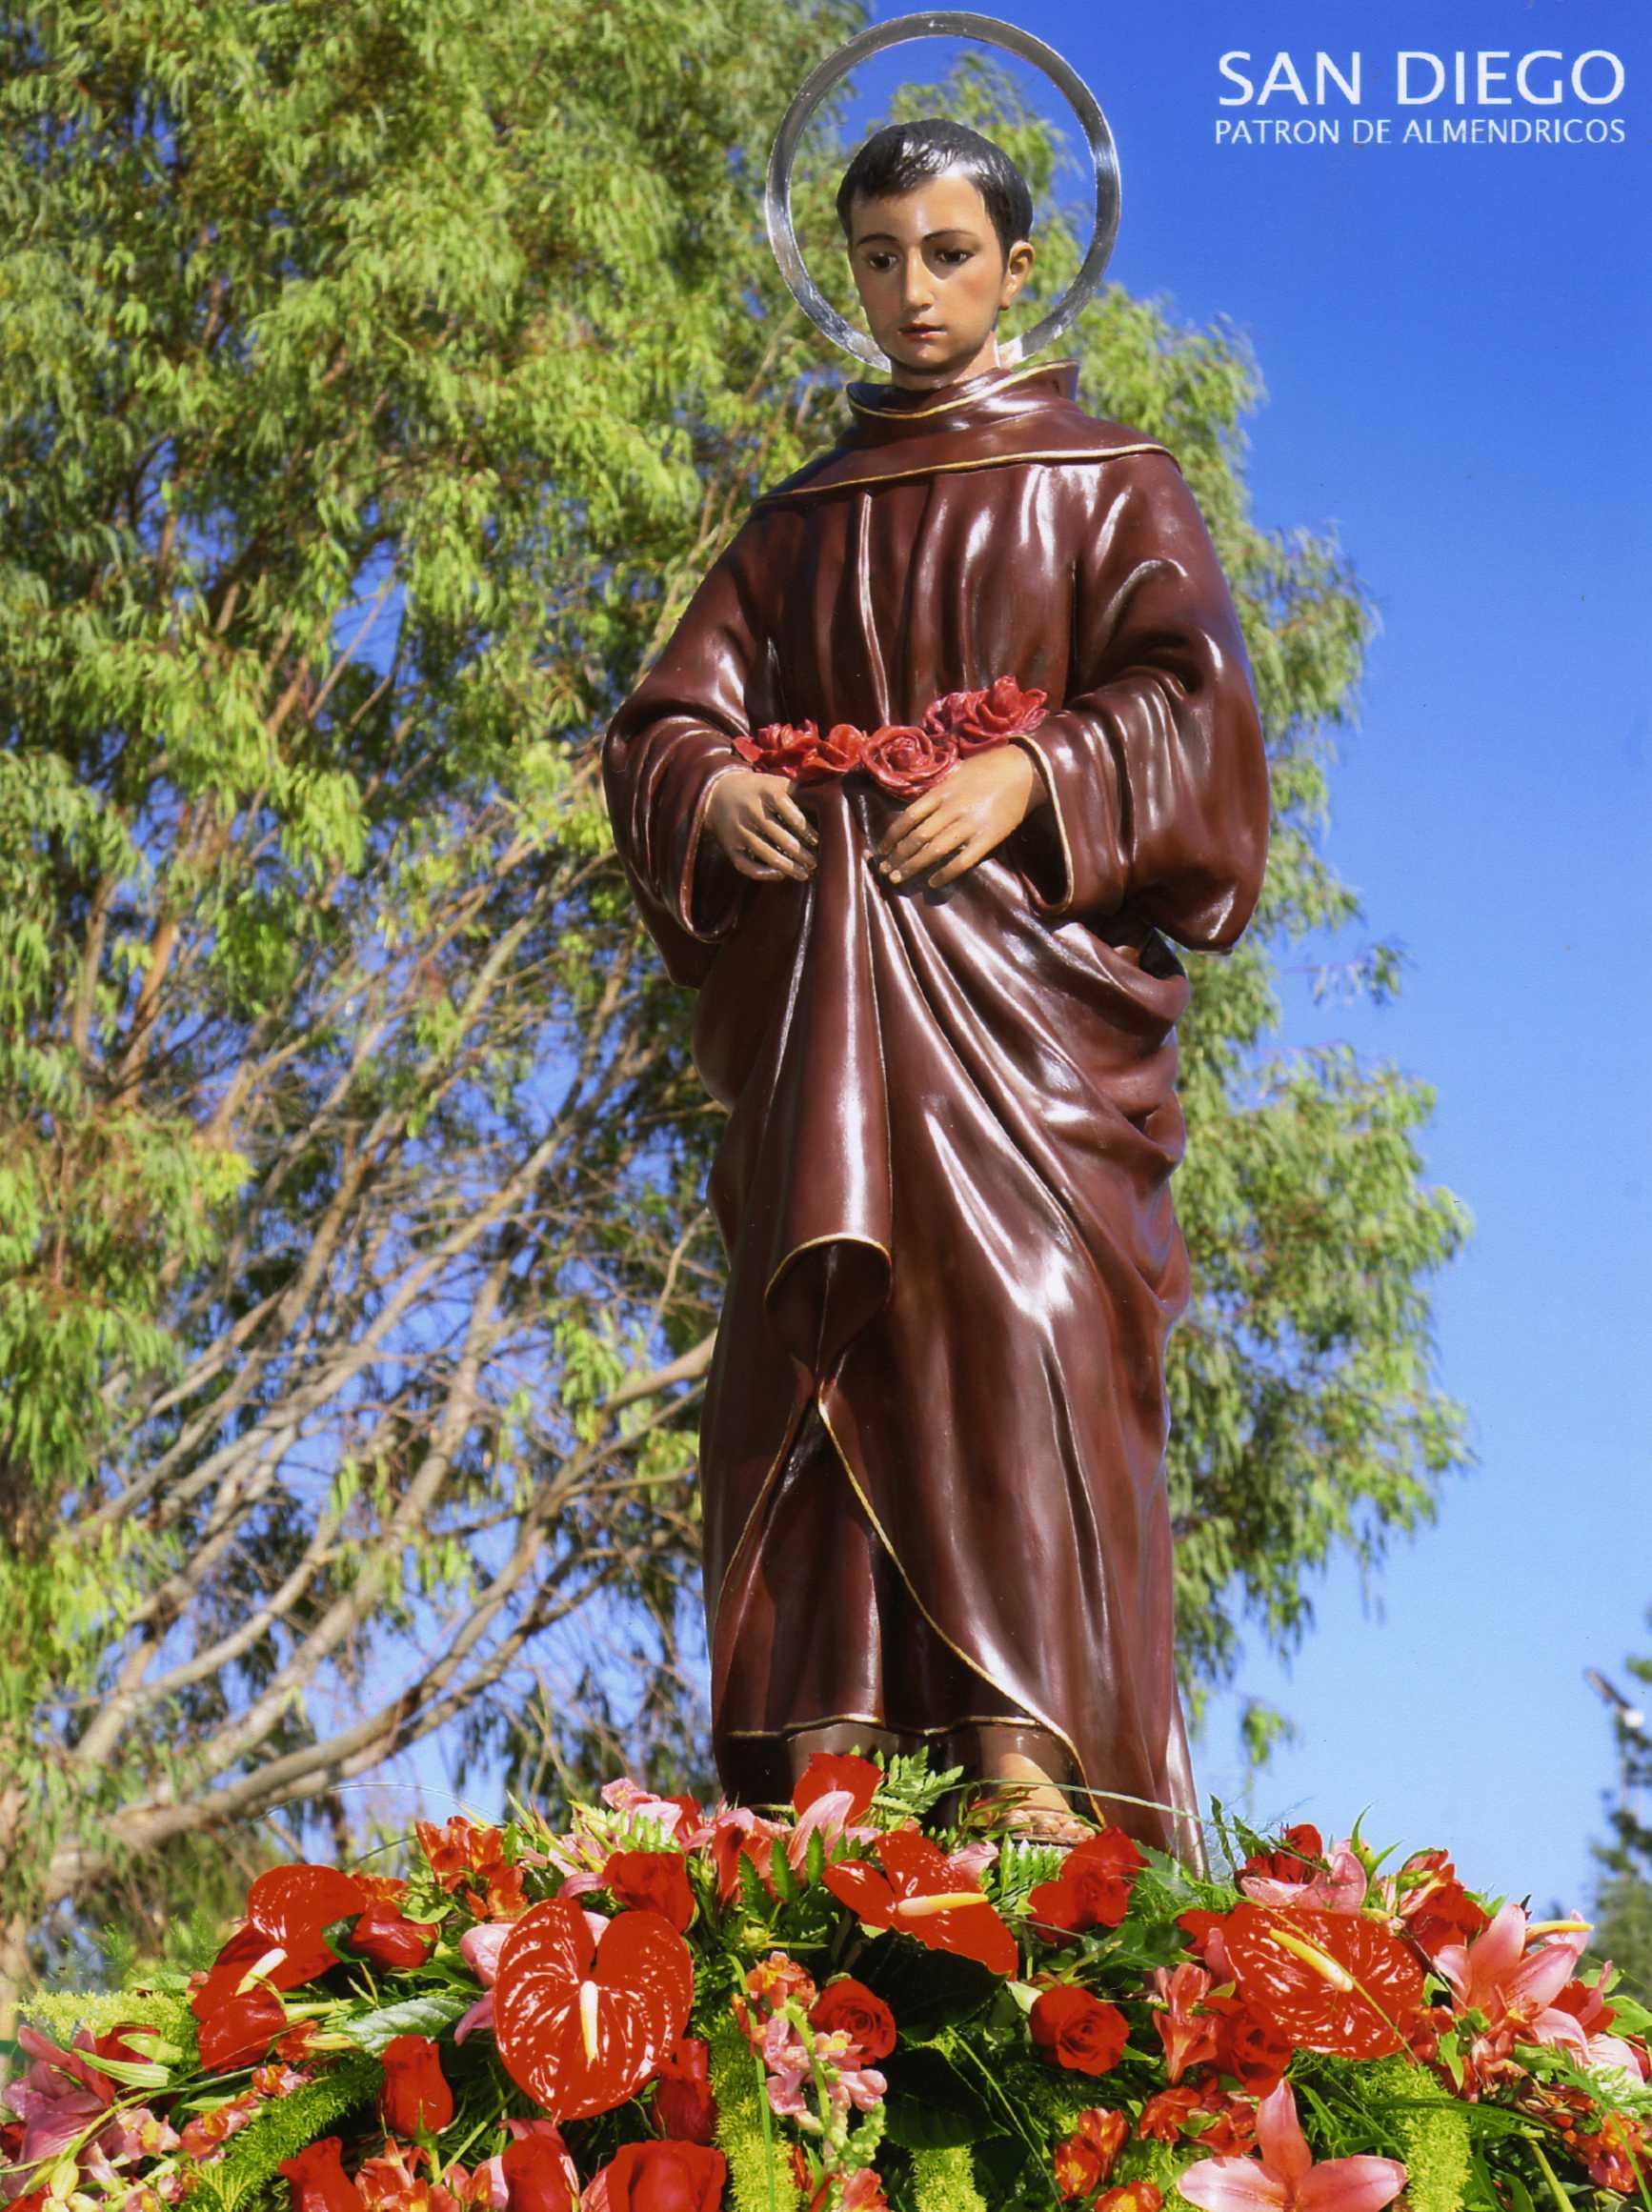 San Diego de Alcalá